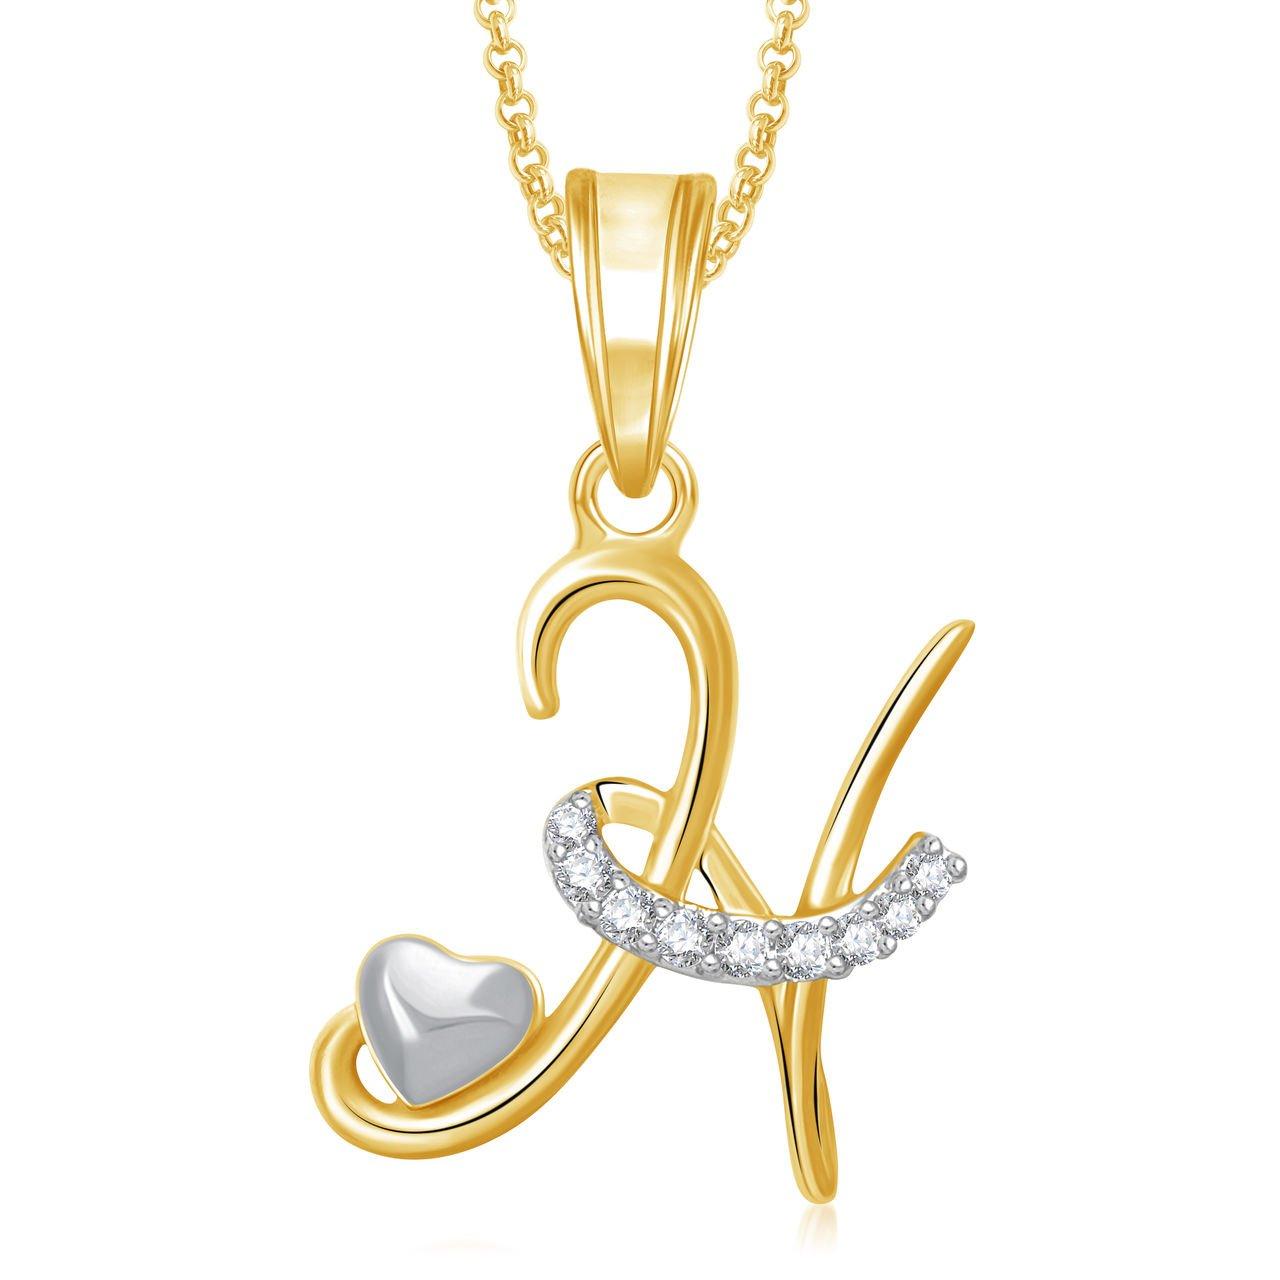 H Letter Images.Meenaz Jewellery Gold Plated H Letter Pendant For Girls Women Men Unisex Alphabet Heart Pendant For Women In American Diamond Crystal Jewellery Set